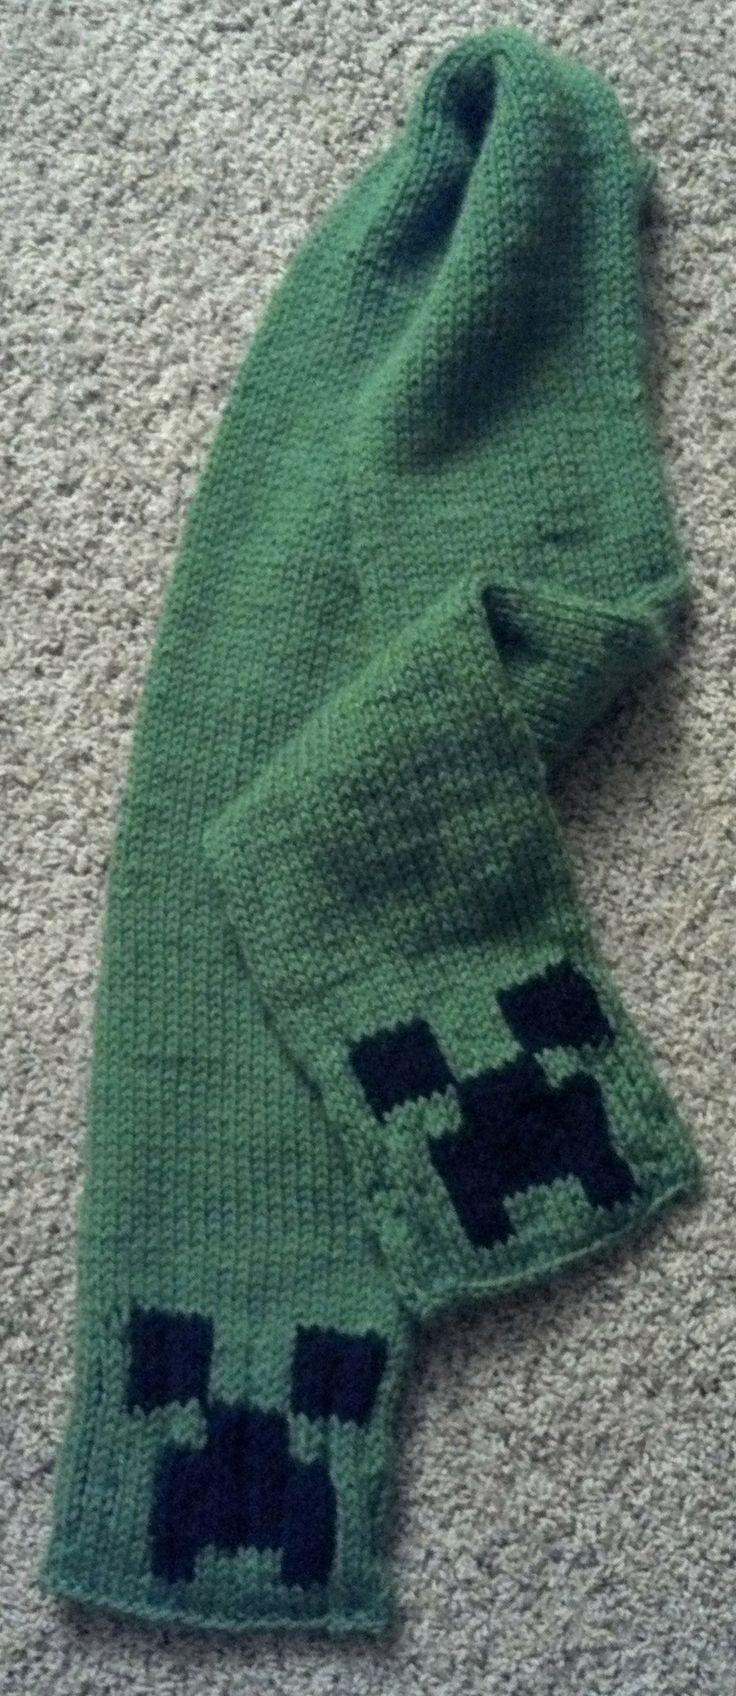 Minecraft Knitting Patterns : Minecraft Creeper Scarf